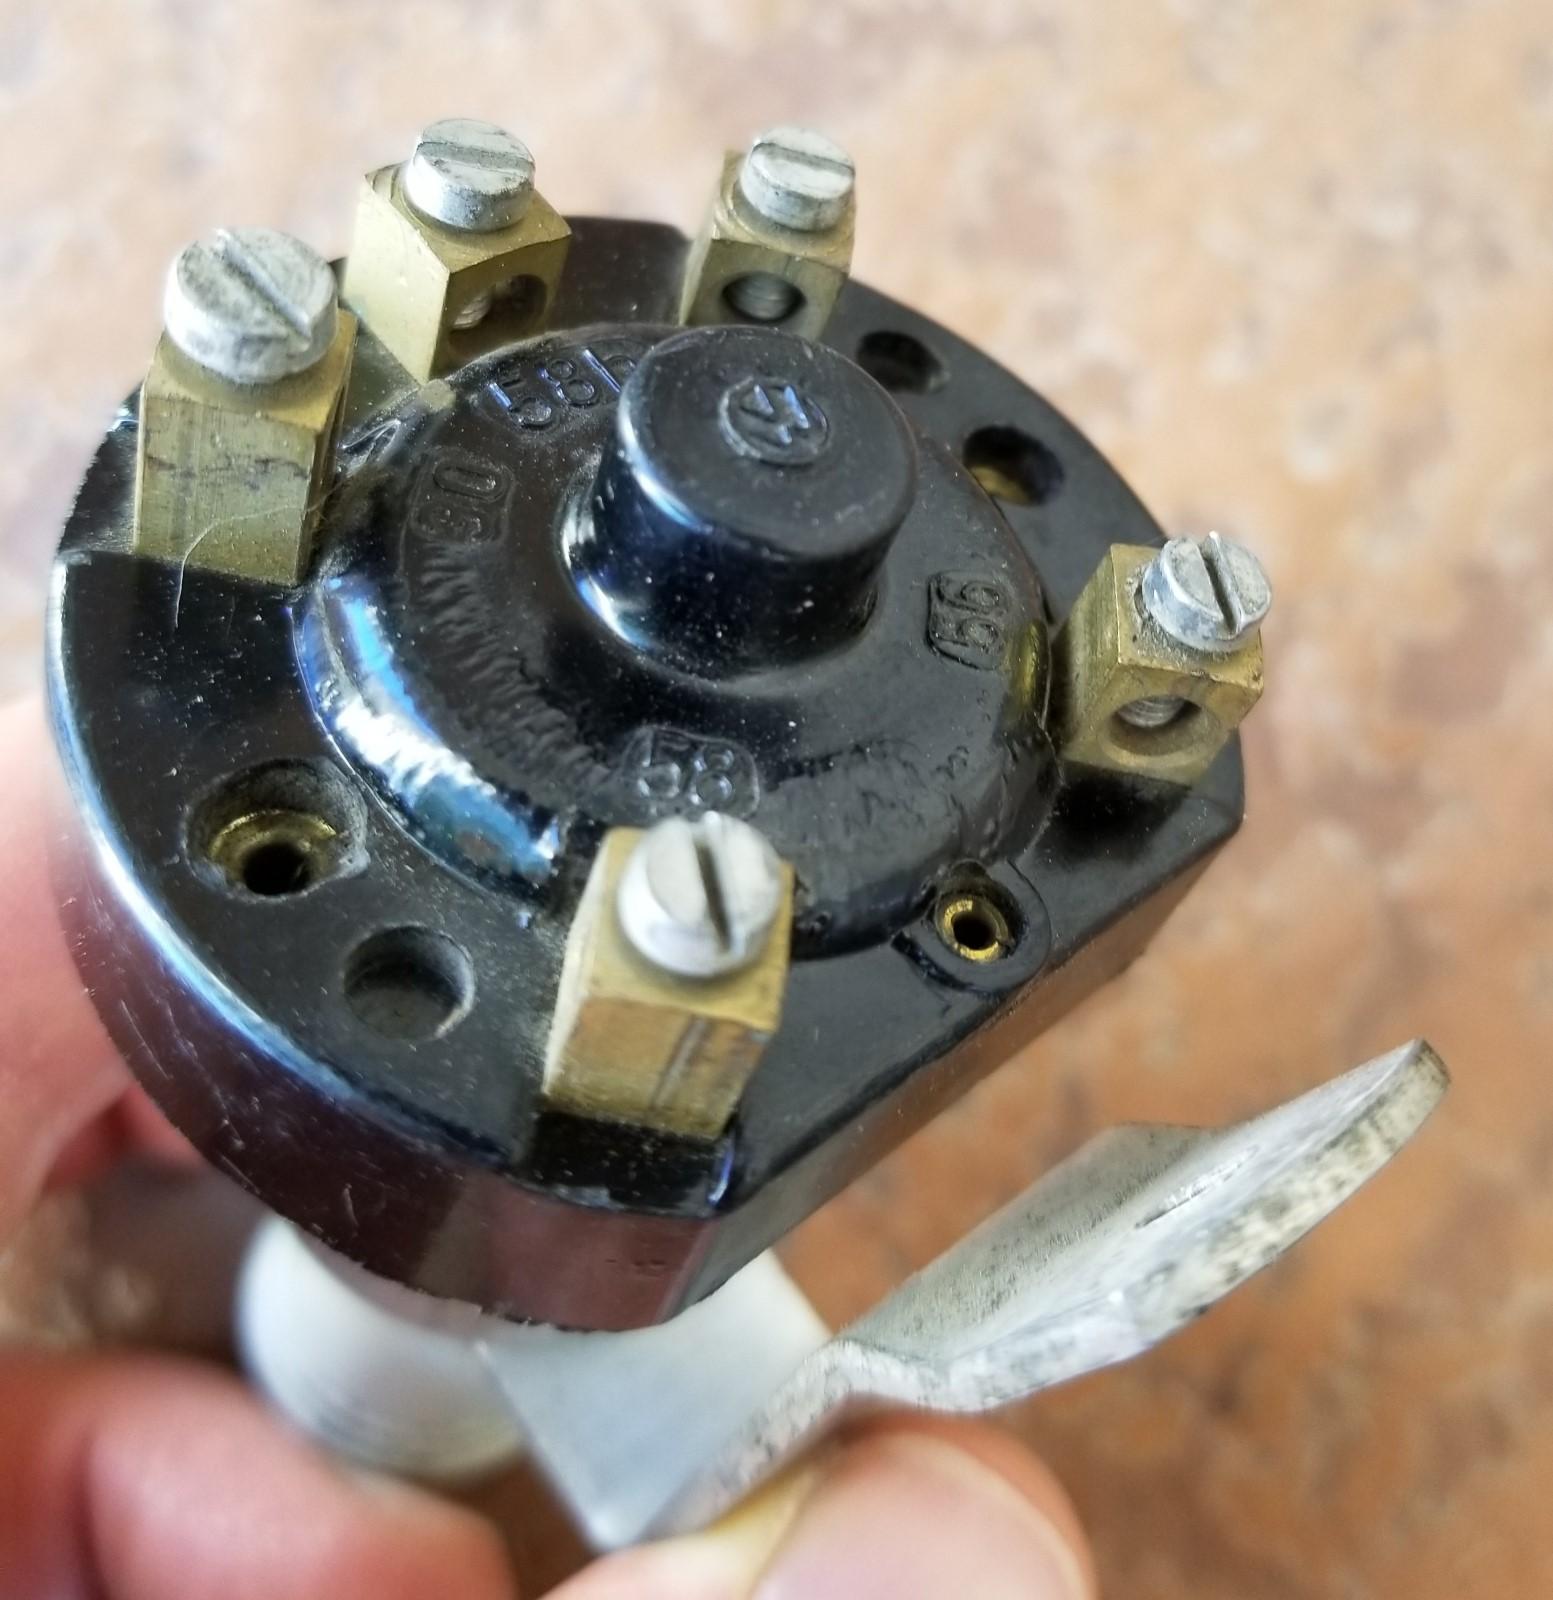 NOS screw-terminal headlight switch